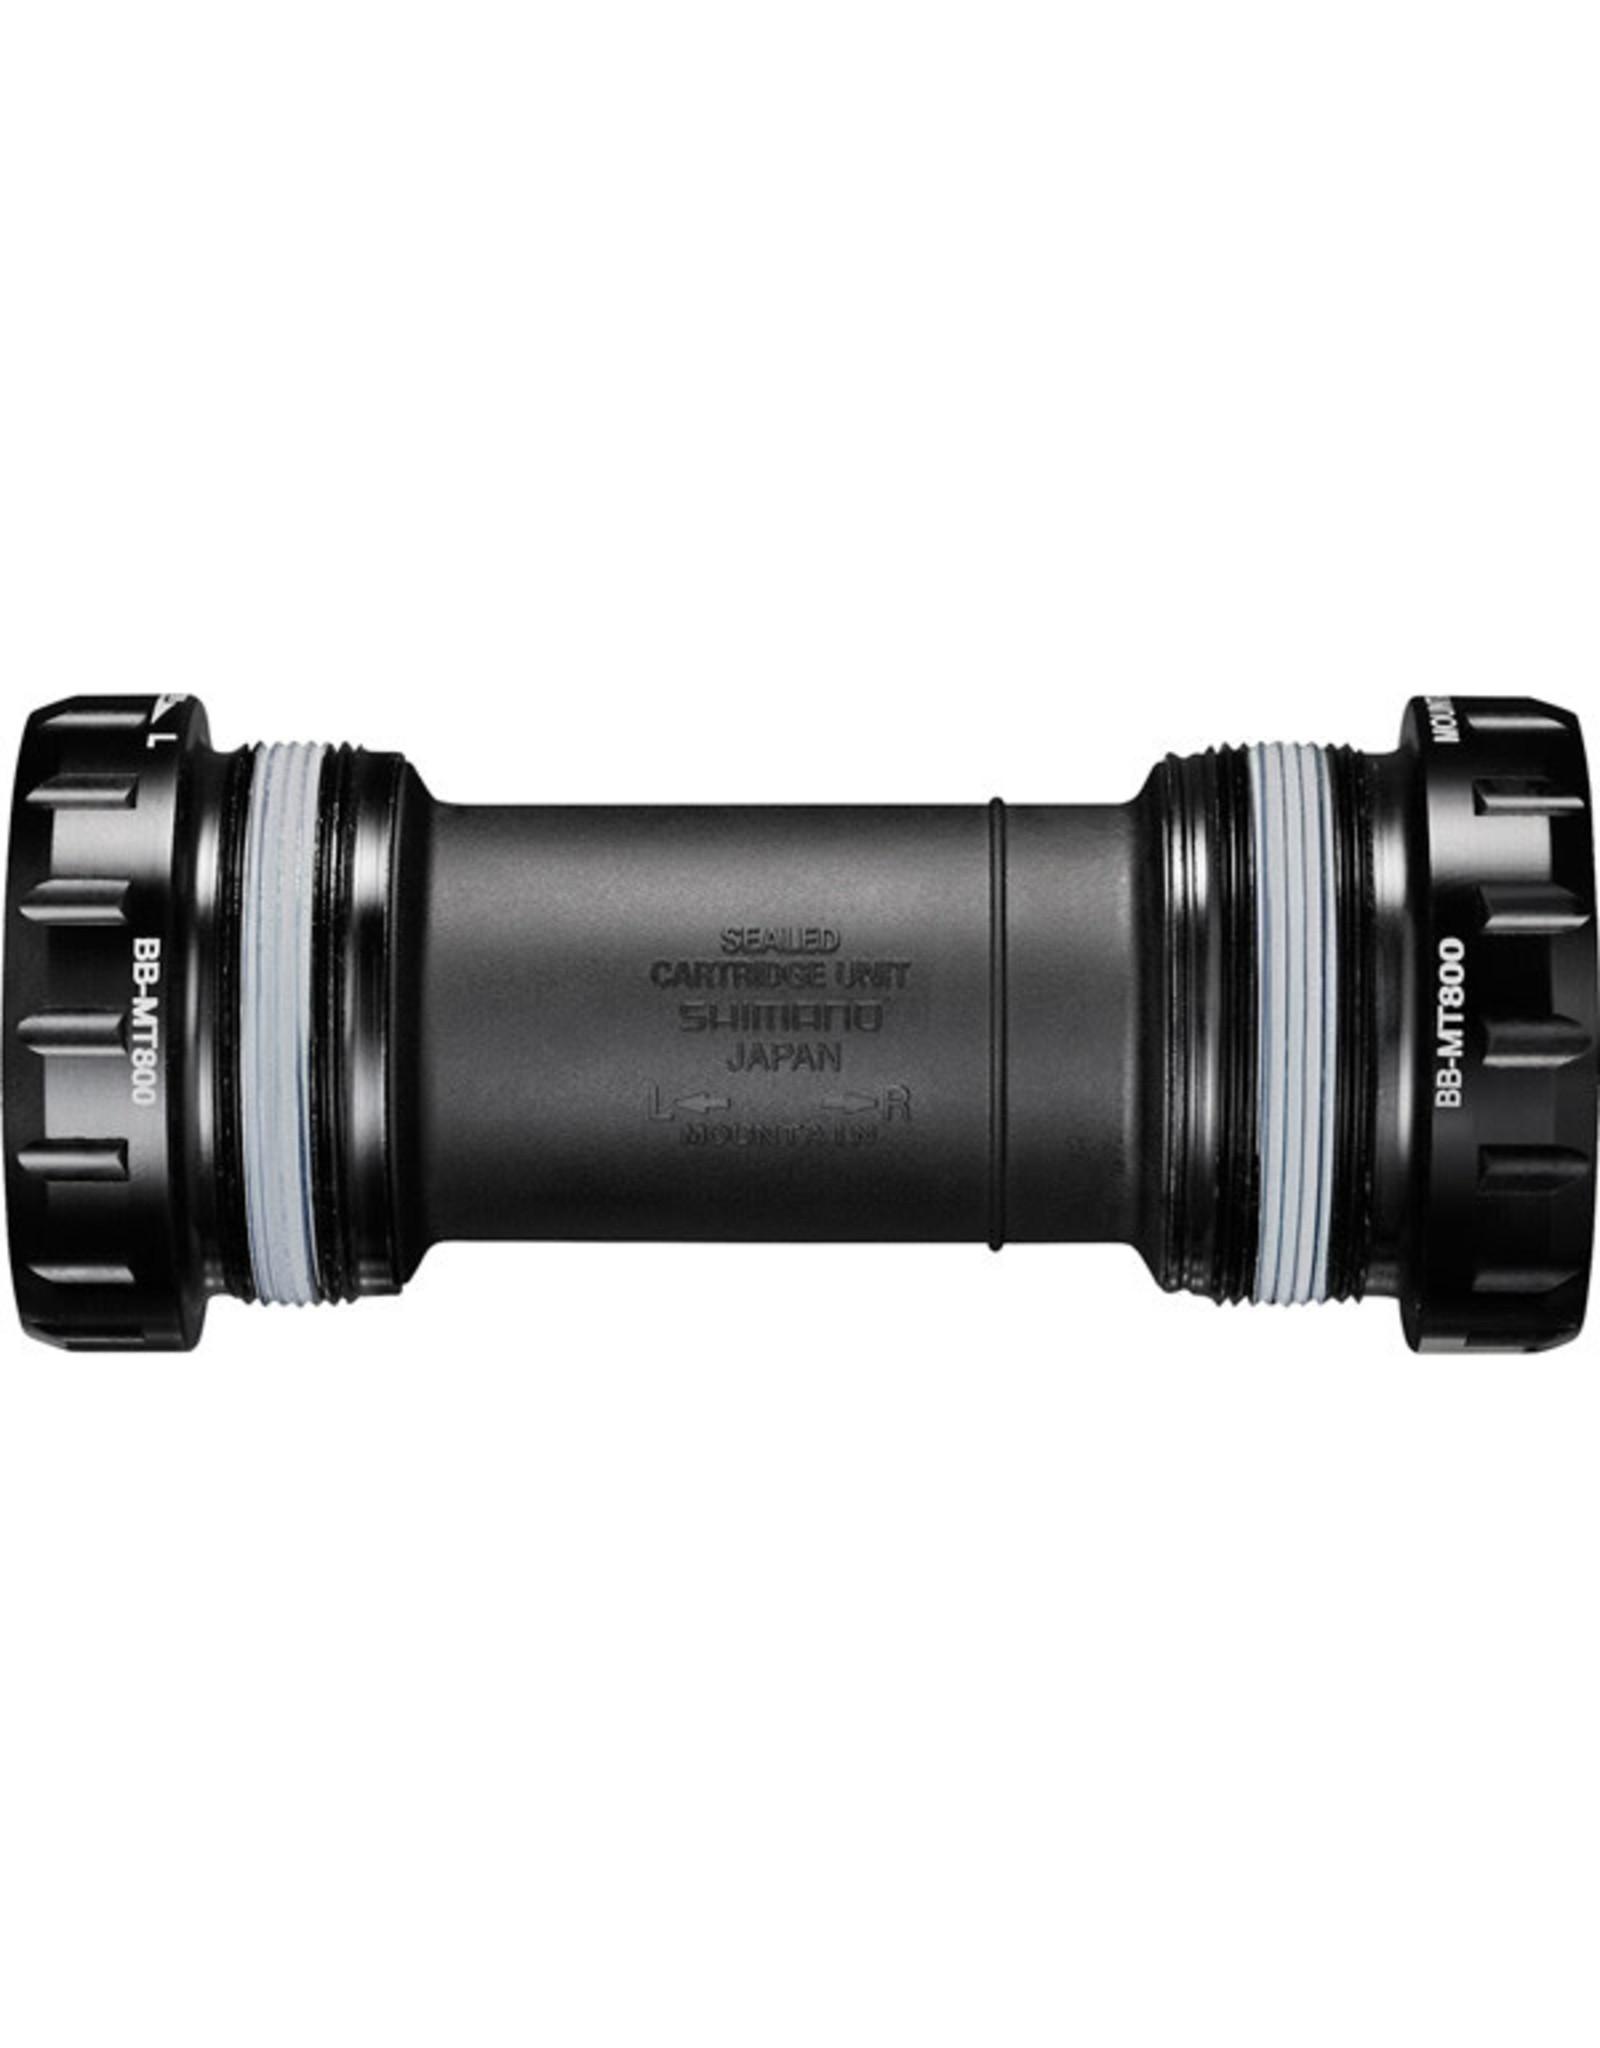 Shimano Bottom Bracket MT800 68/73mm BSA